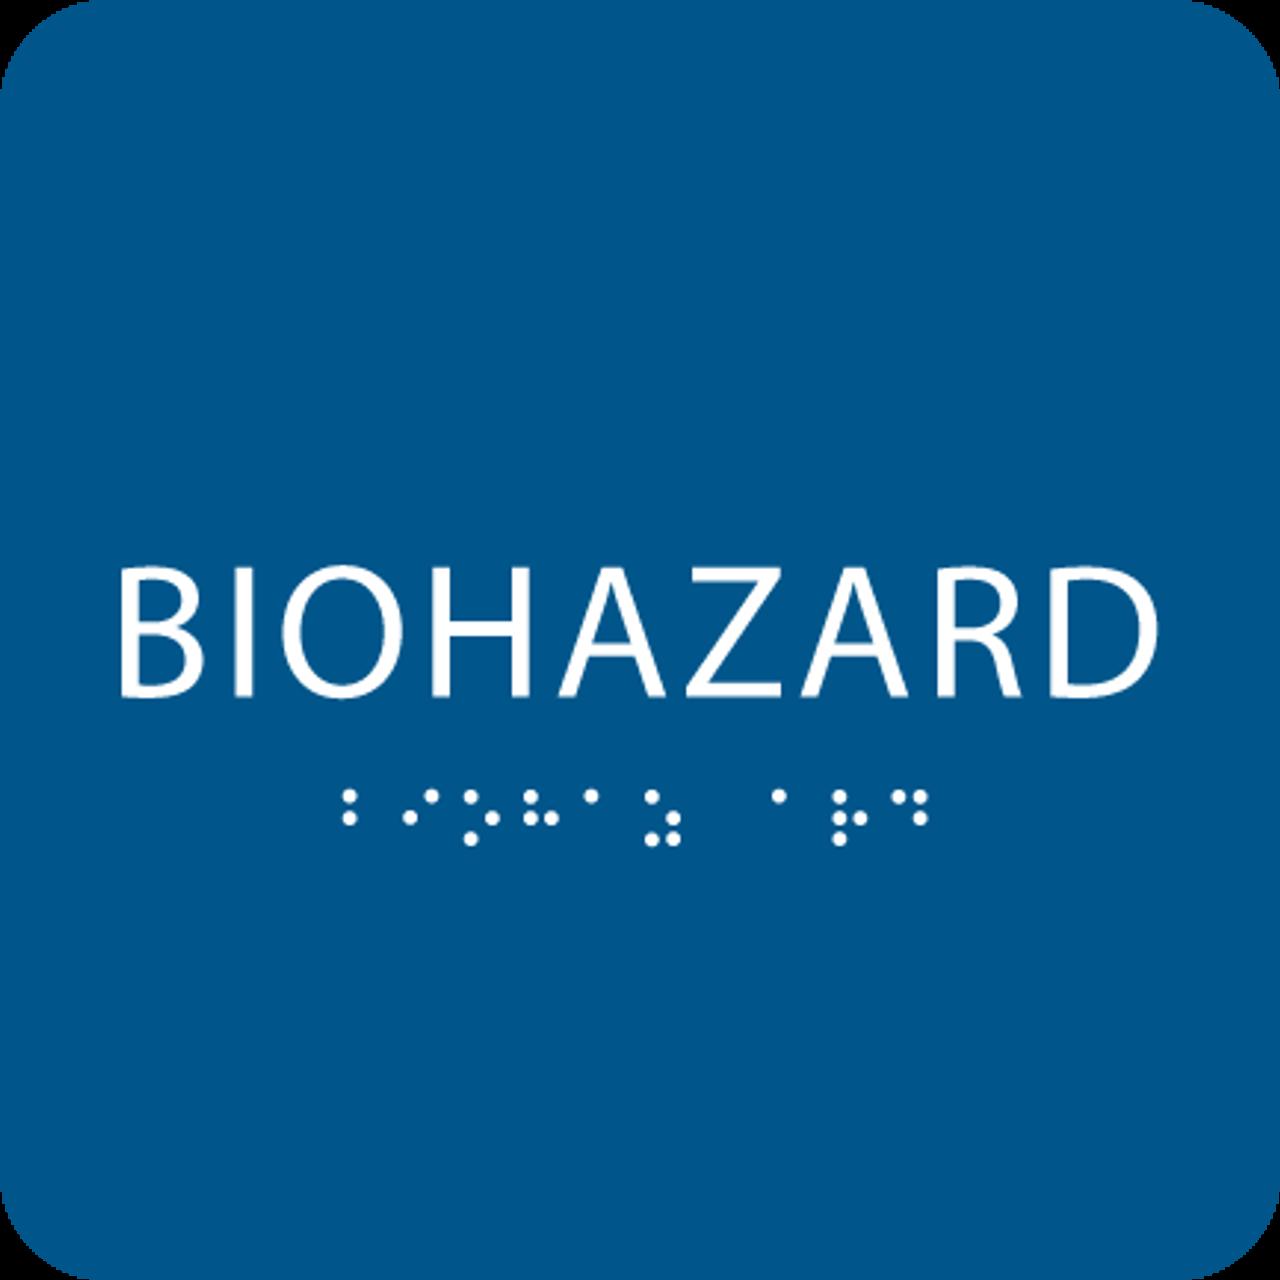 Blue Biohazard ADA Sign